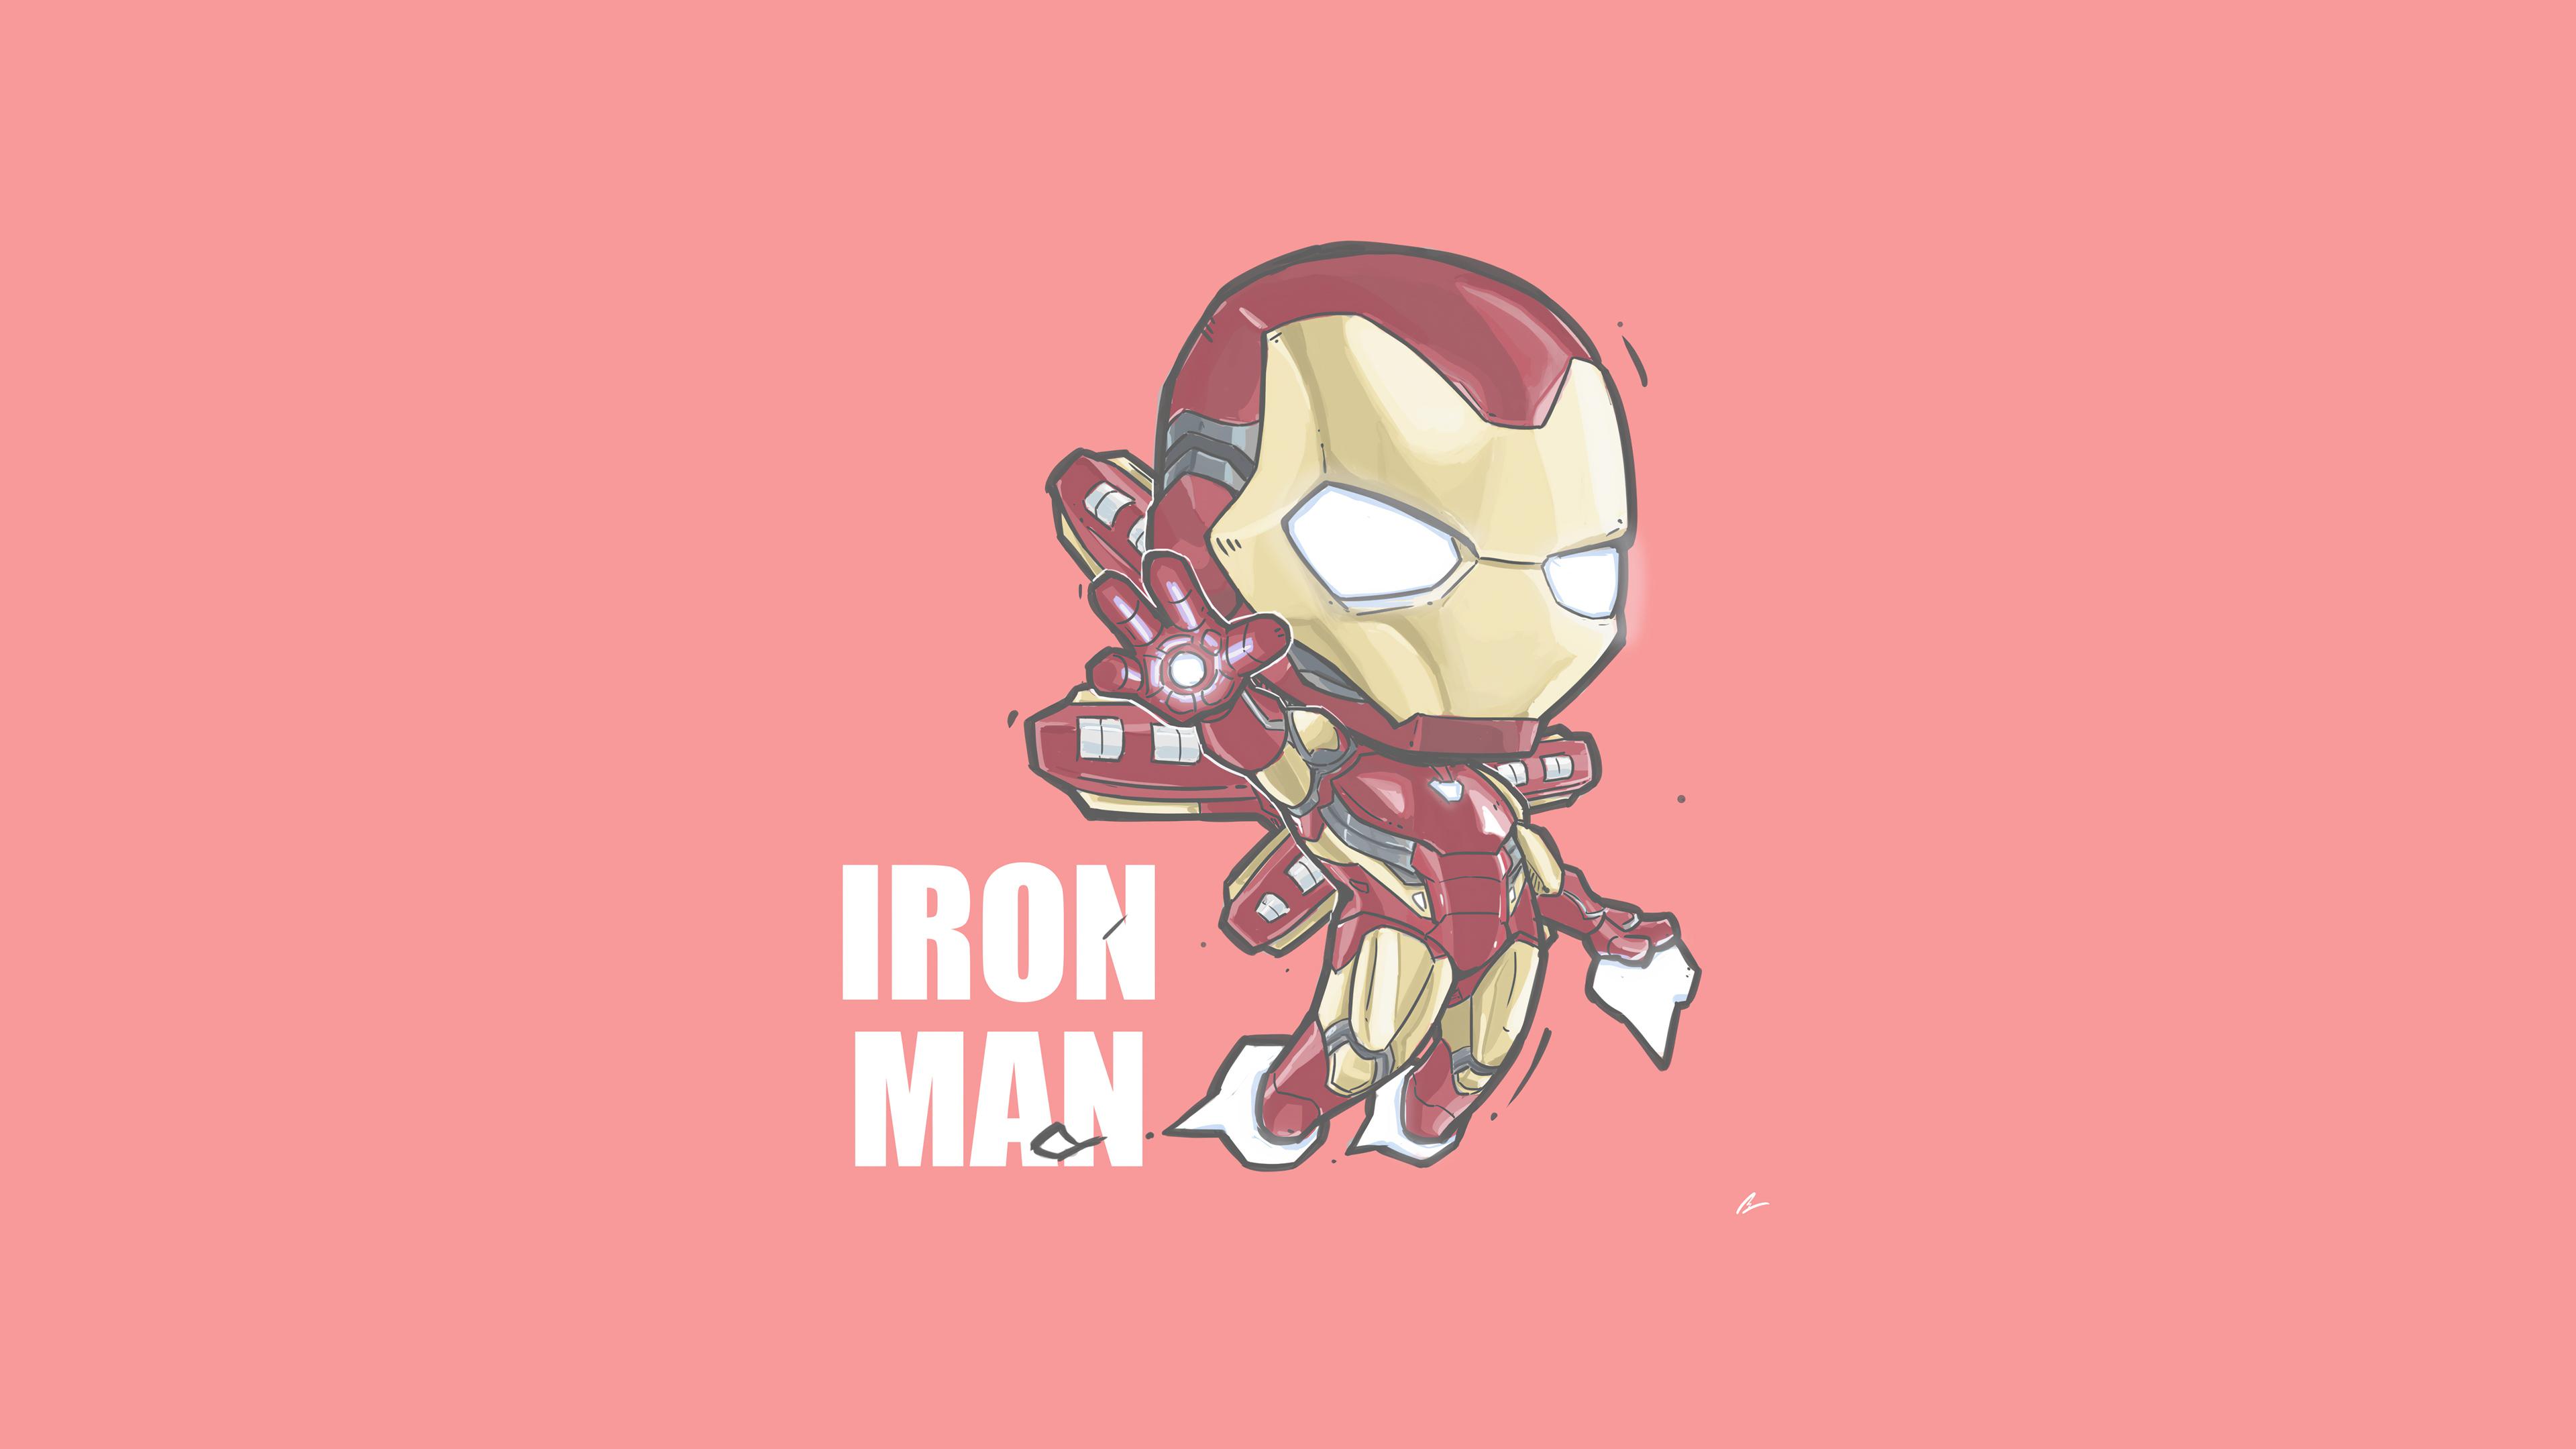 Wallpaper Iron Man Minimalist